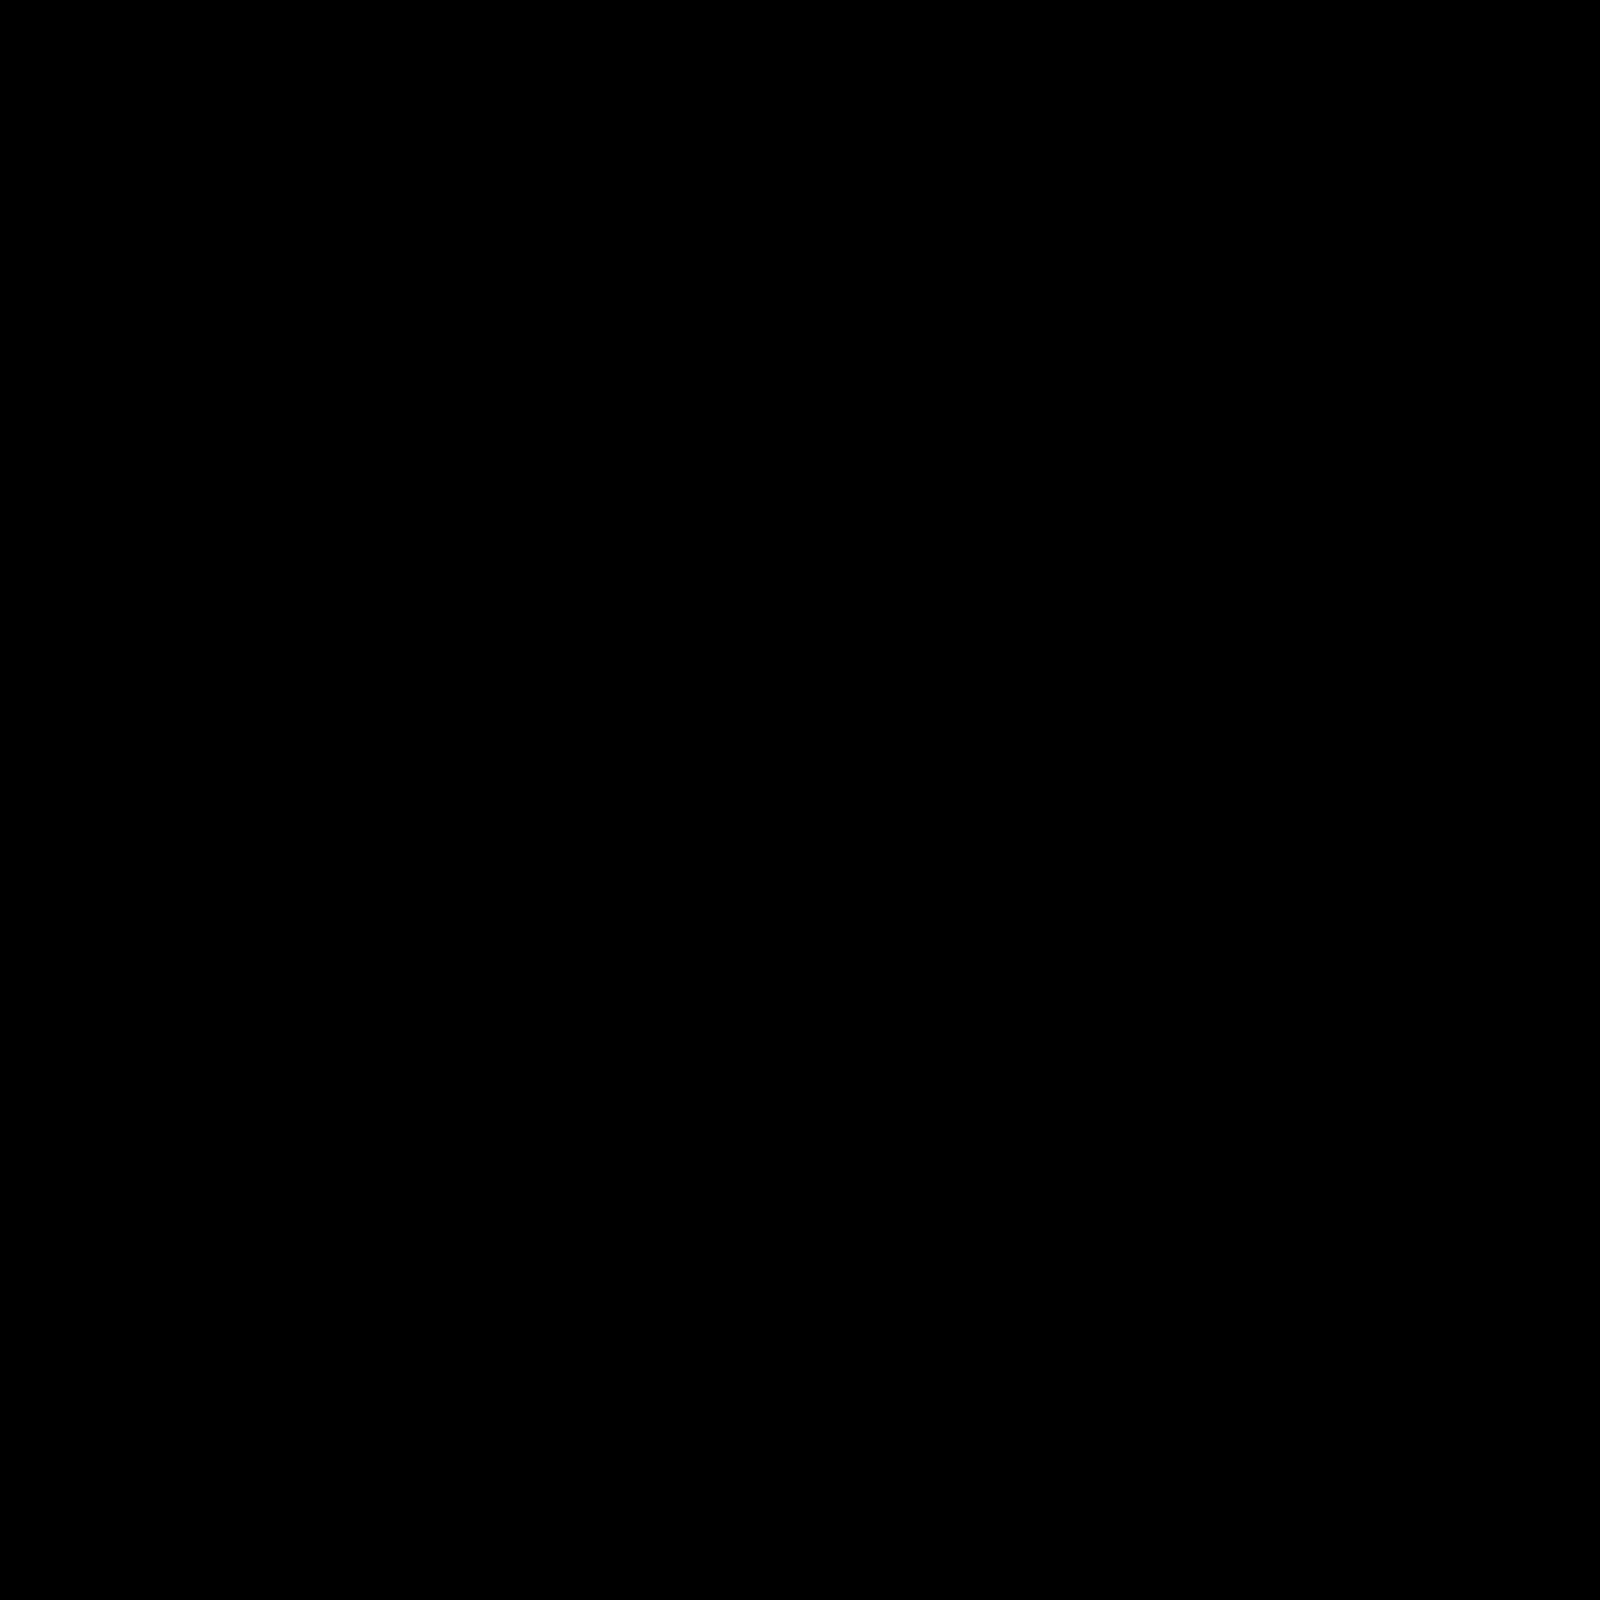 1600x1600 Registered Trademark Icon